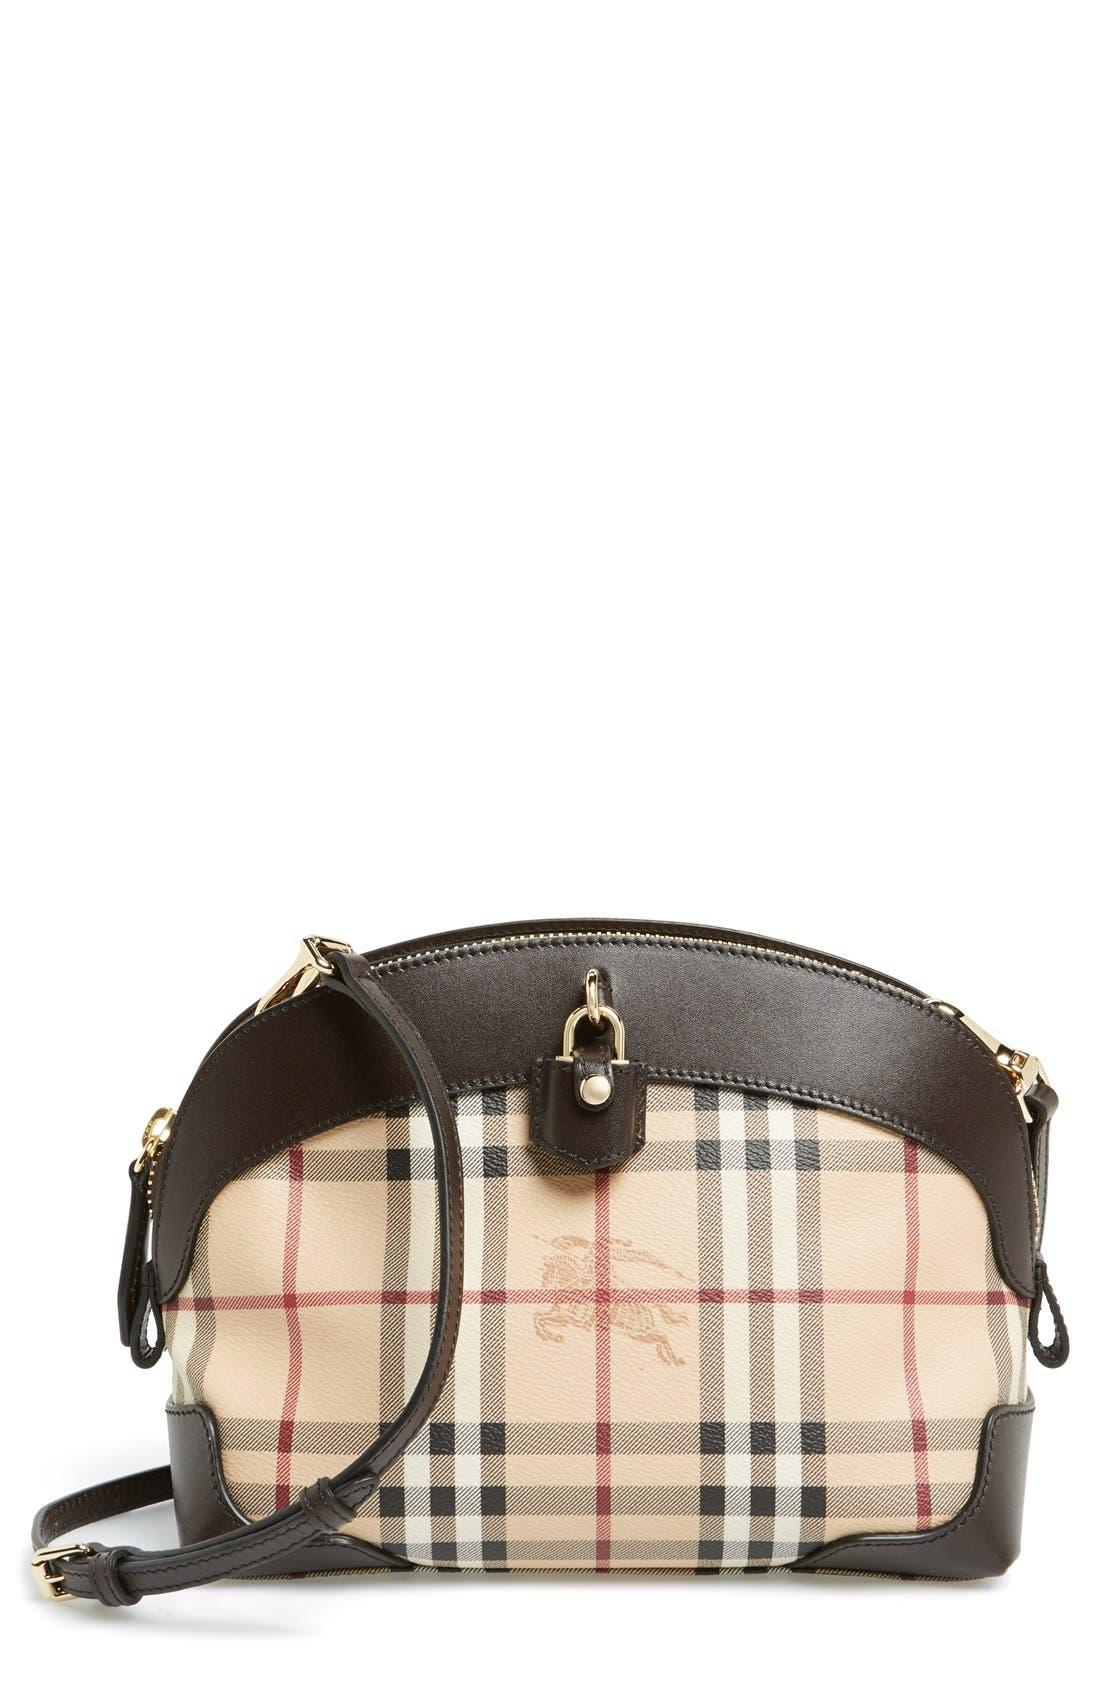 Alternate Image 1 Selected - Burberry 'Small Primrose' Crossbody Bag